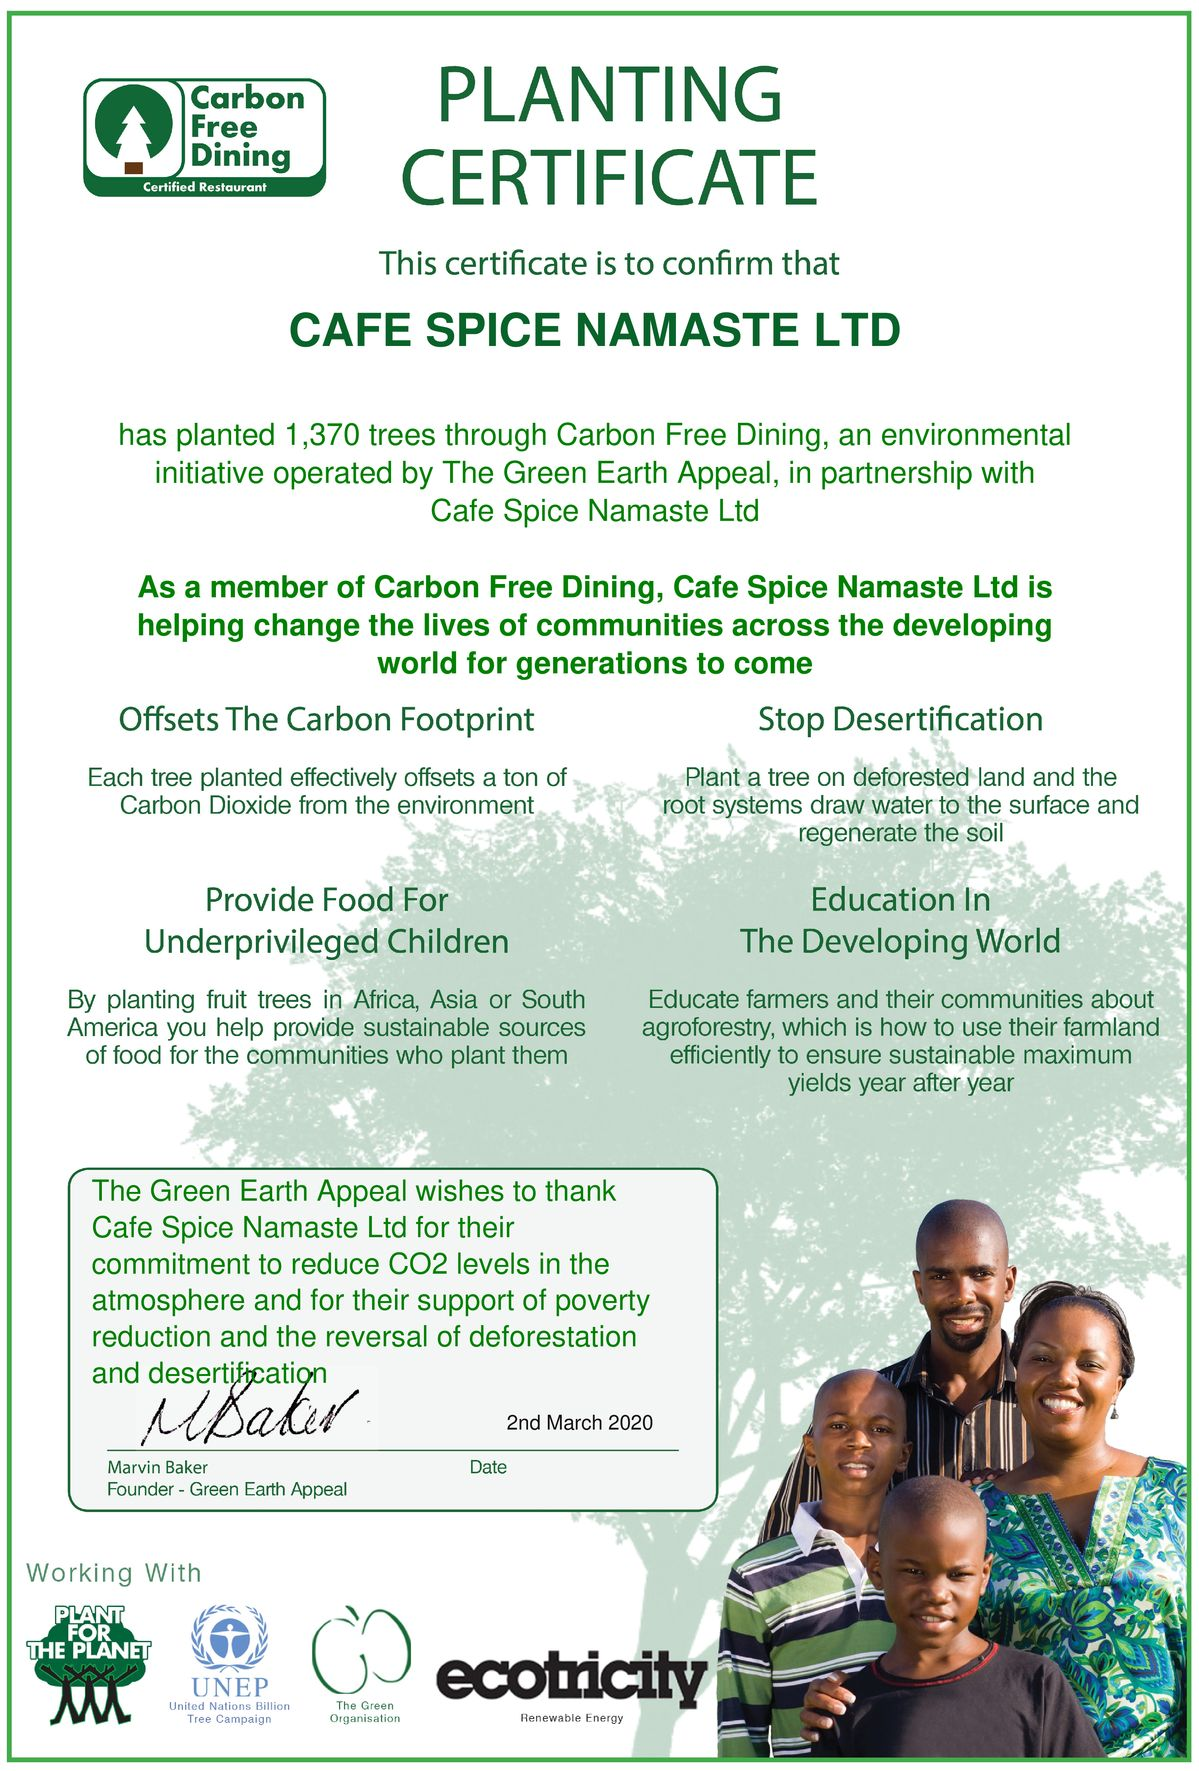 Cyrus Todiwala Café Spice Namaste